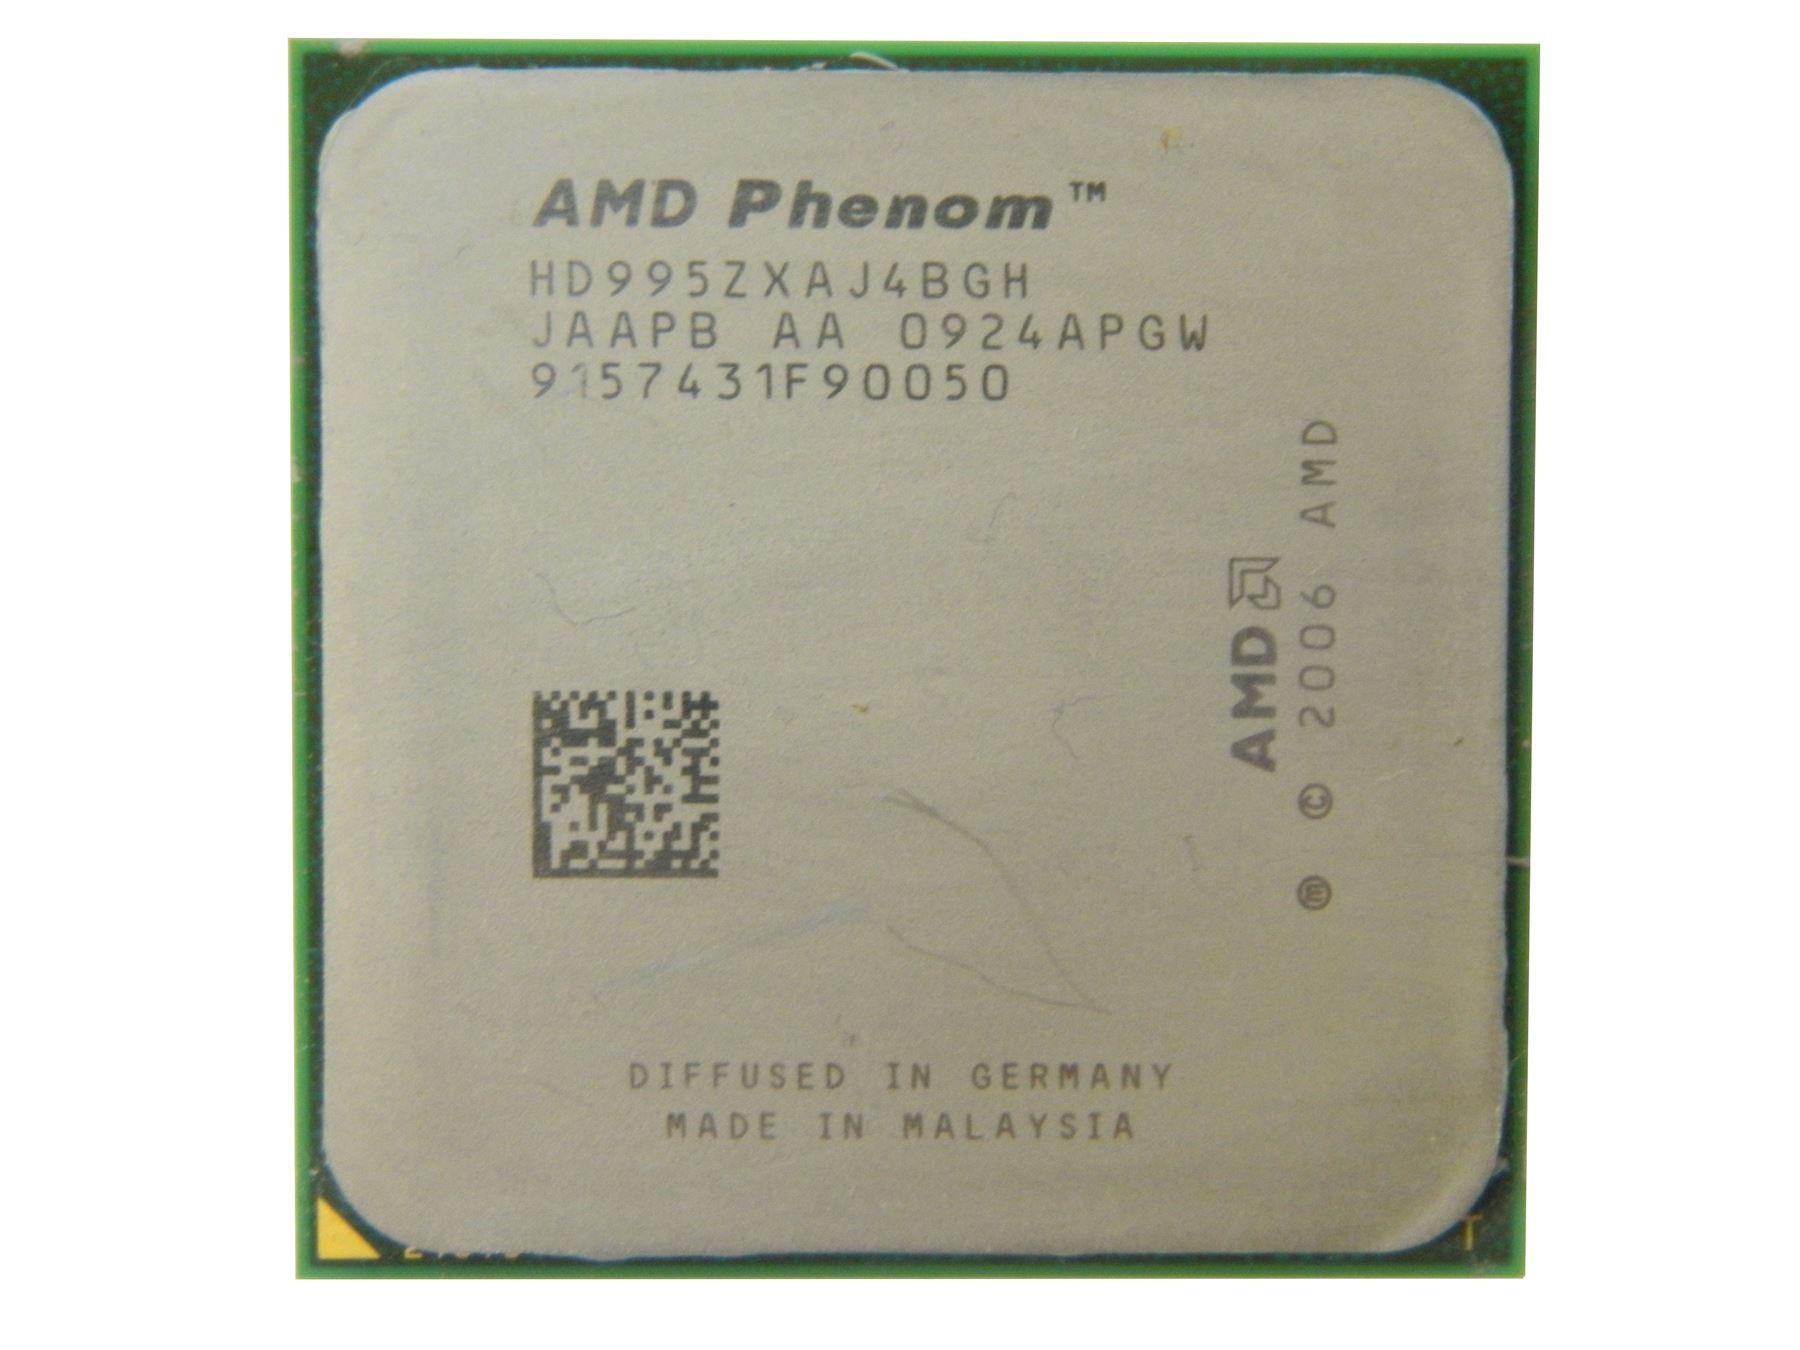 AMD Phenom X4 9950 Black Edition | Quad Core 2.6GHz | AM2+ CPU Processor | eBay